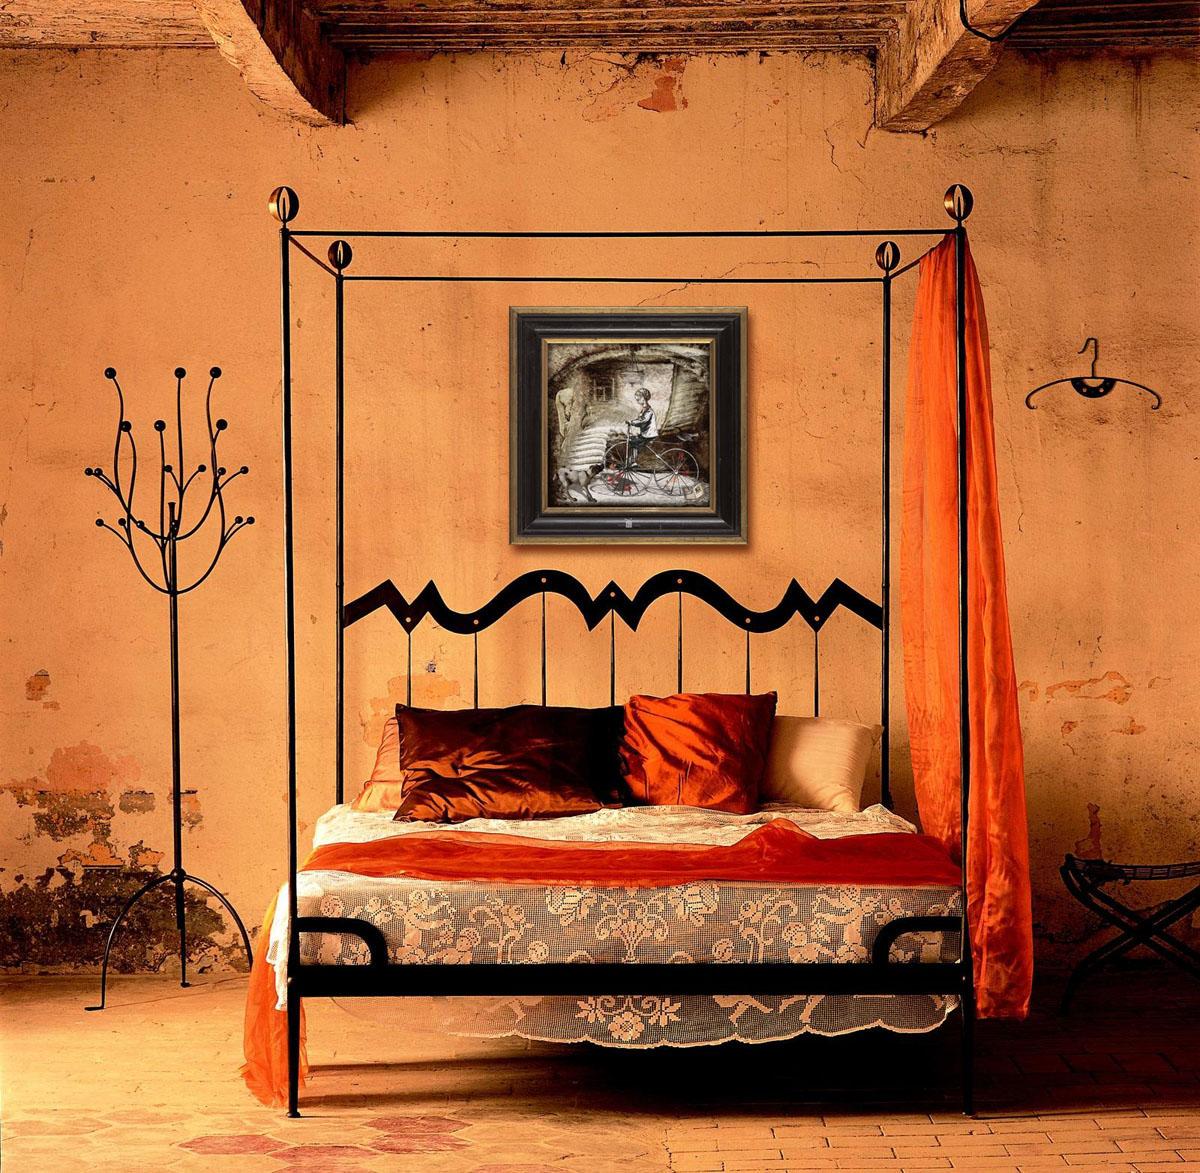 Tuscan-Beds-Design-Ideas_11.jpg